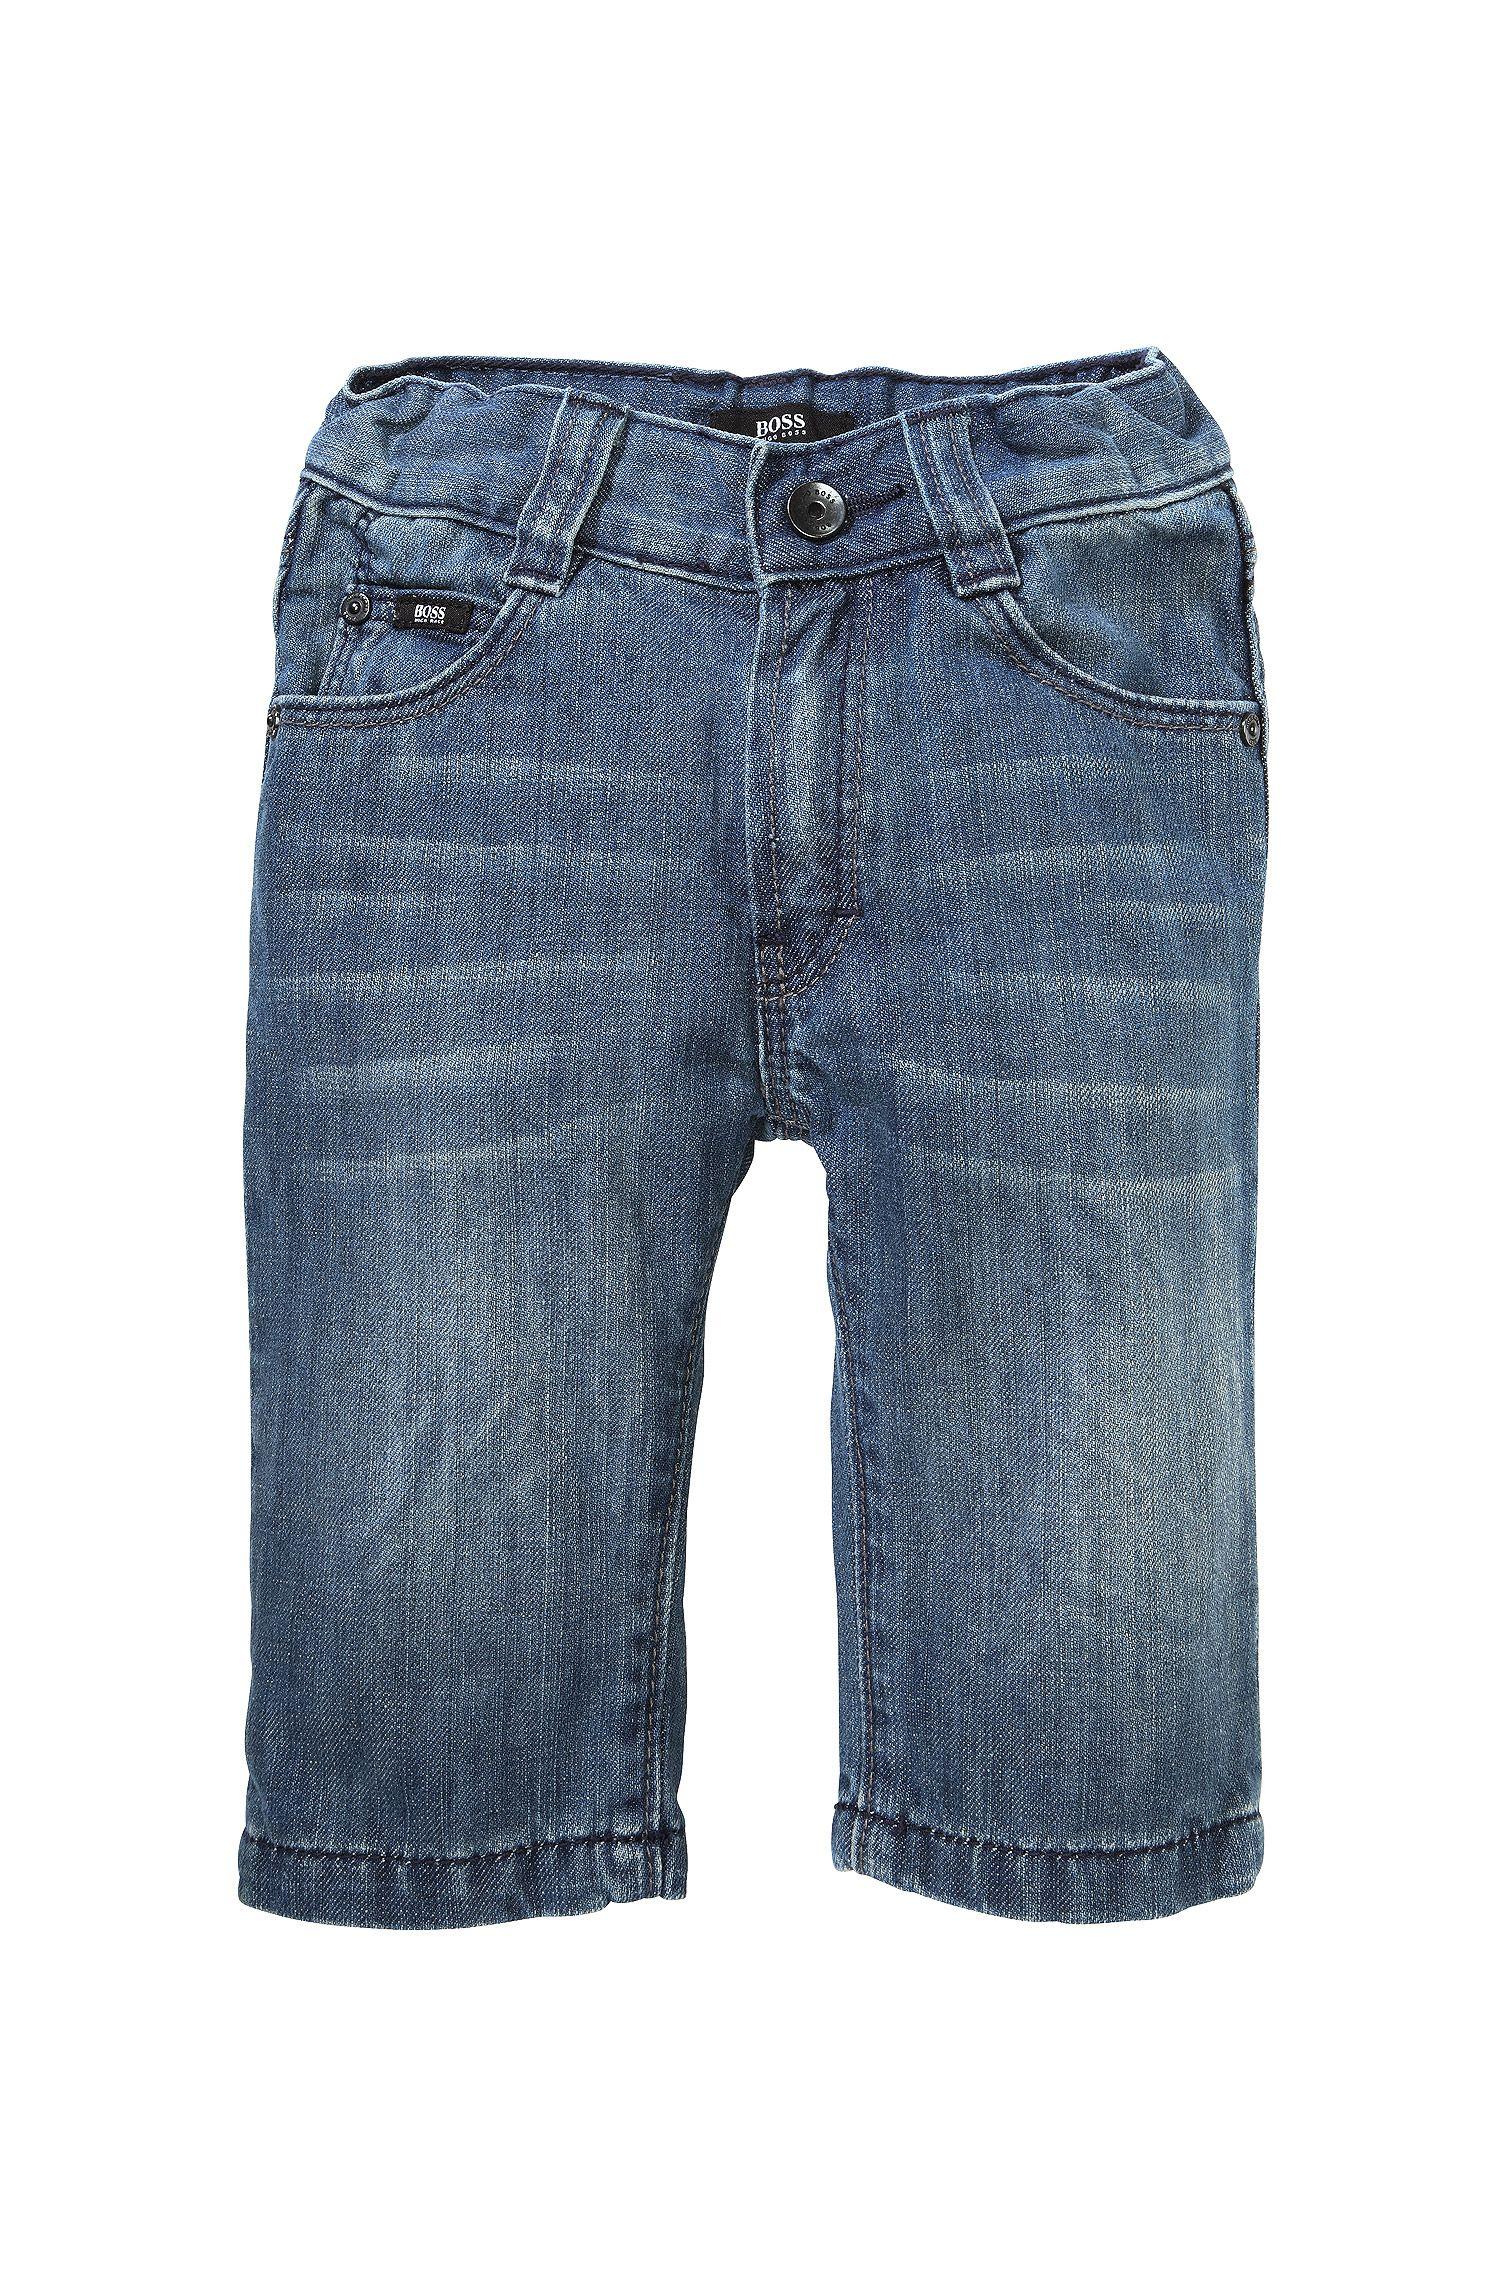 Kids-Jeans ´J04159` aus Baumwolle